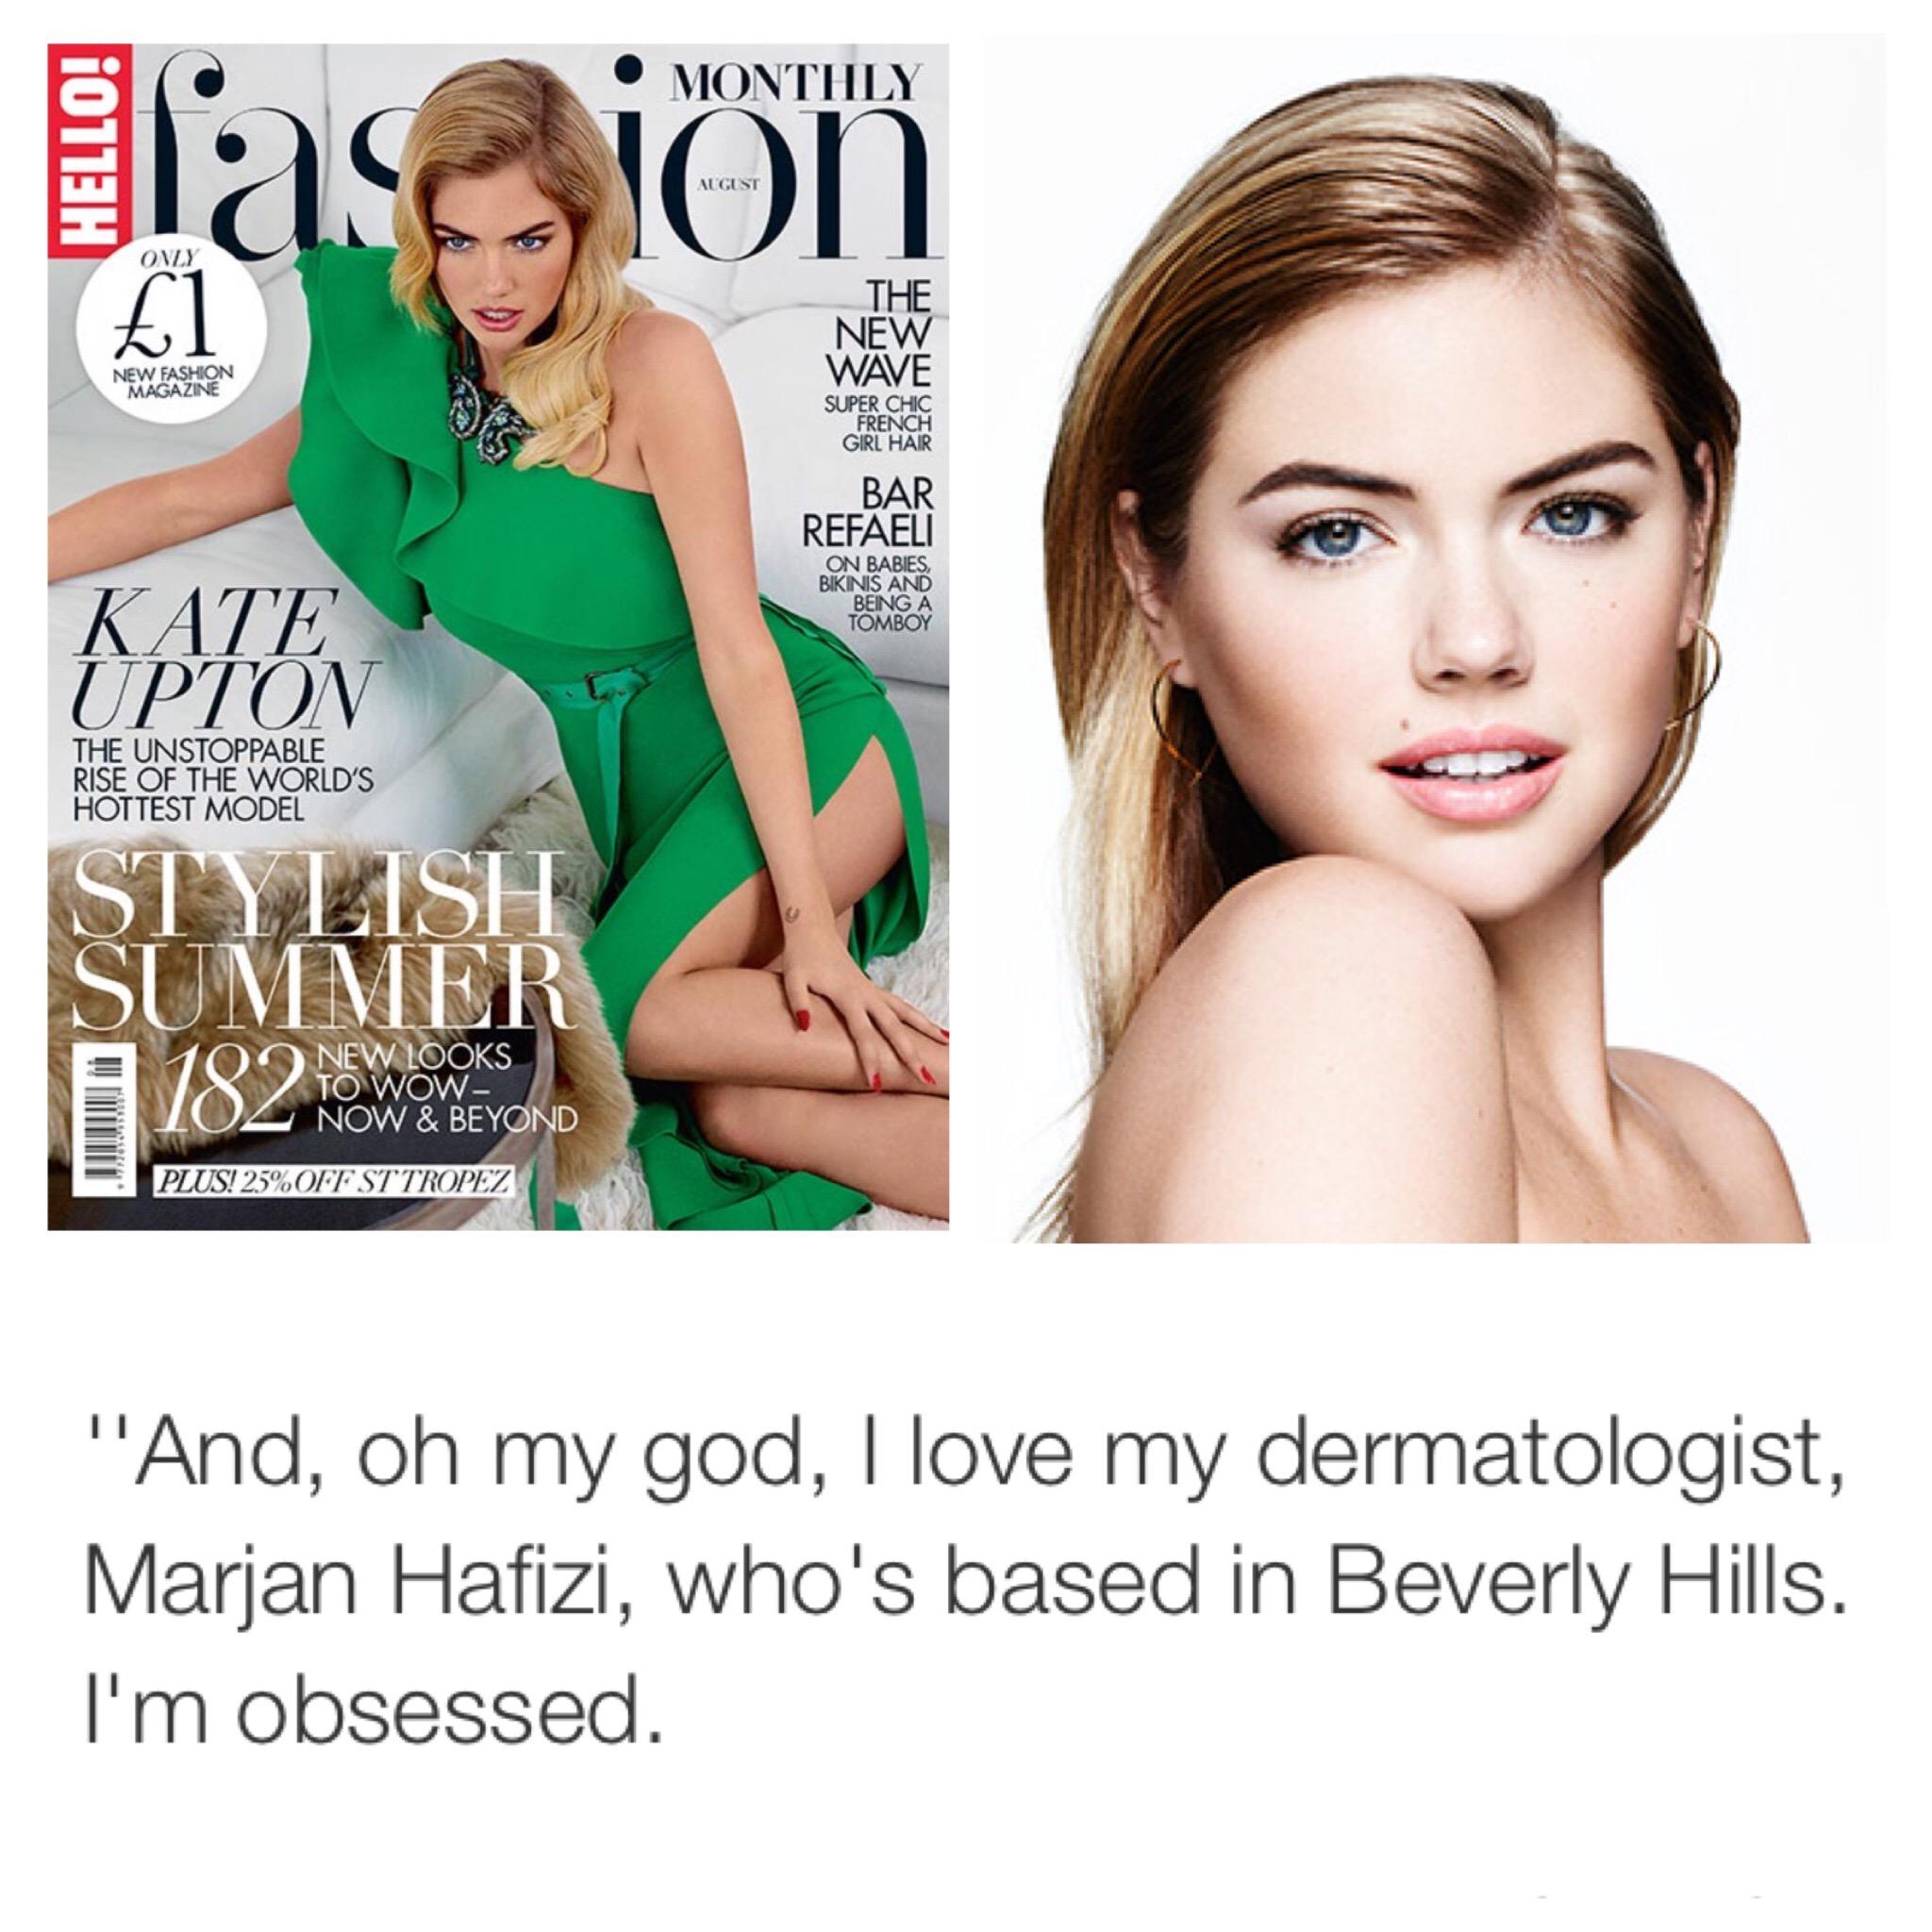 Kate Upton's Beverly Hills Dermatologist | Beverly Hills